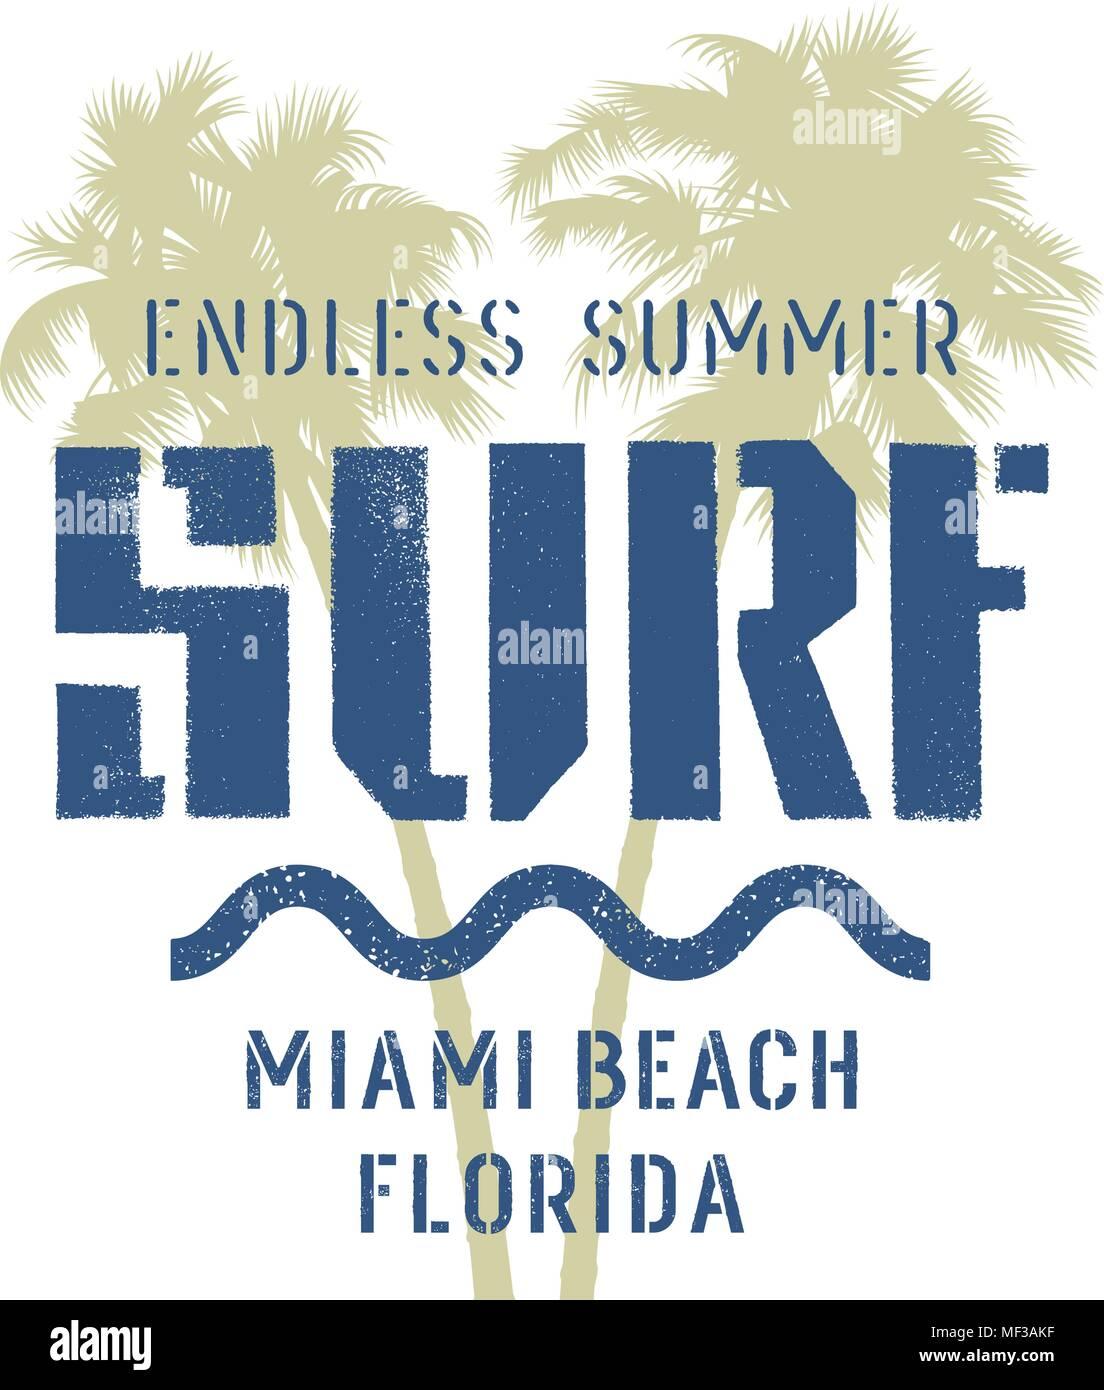 b1c72ab7e4b Surfing artwork. Miami Beach Florida t-shirt apparel graphic design ...